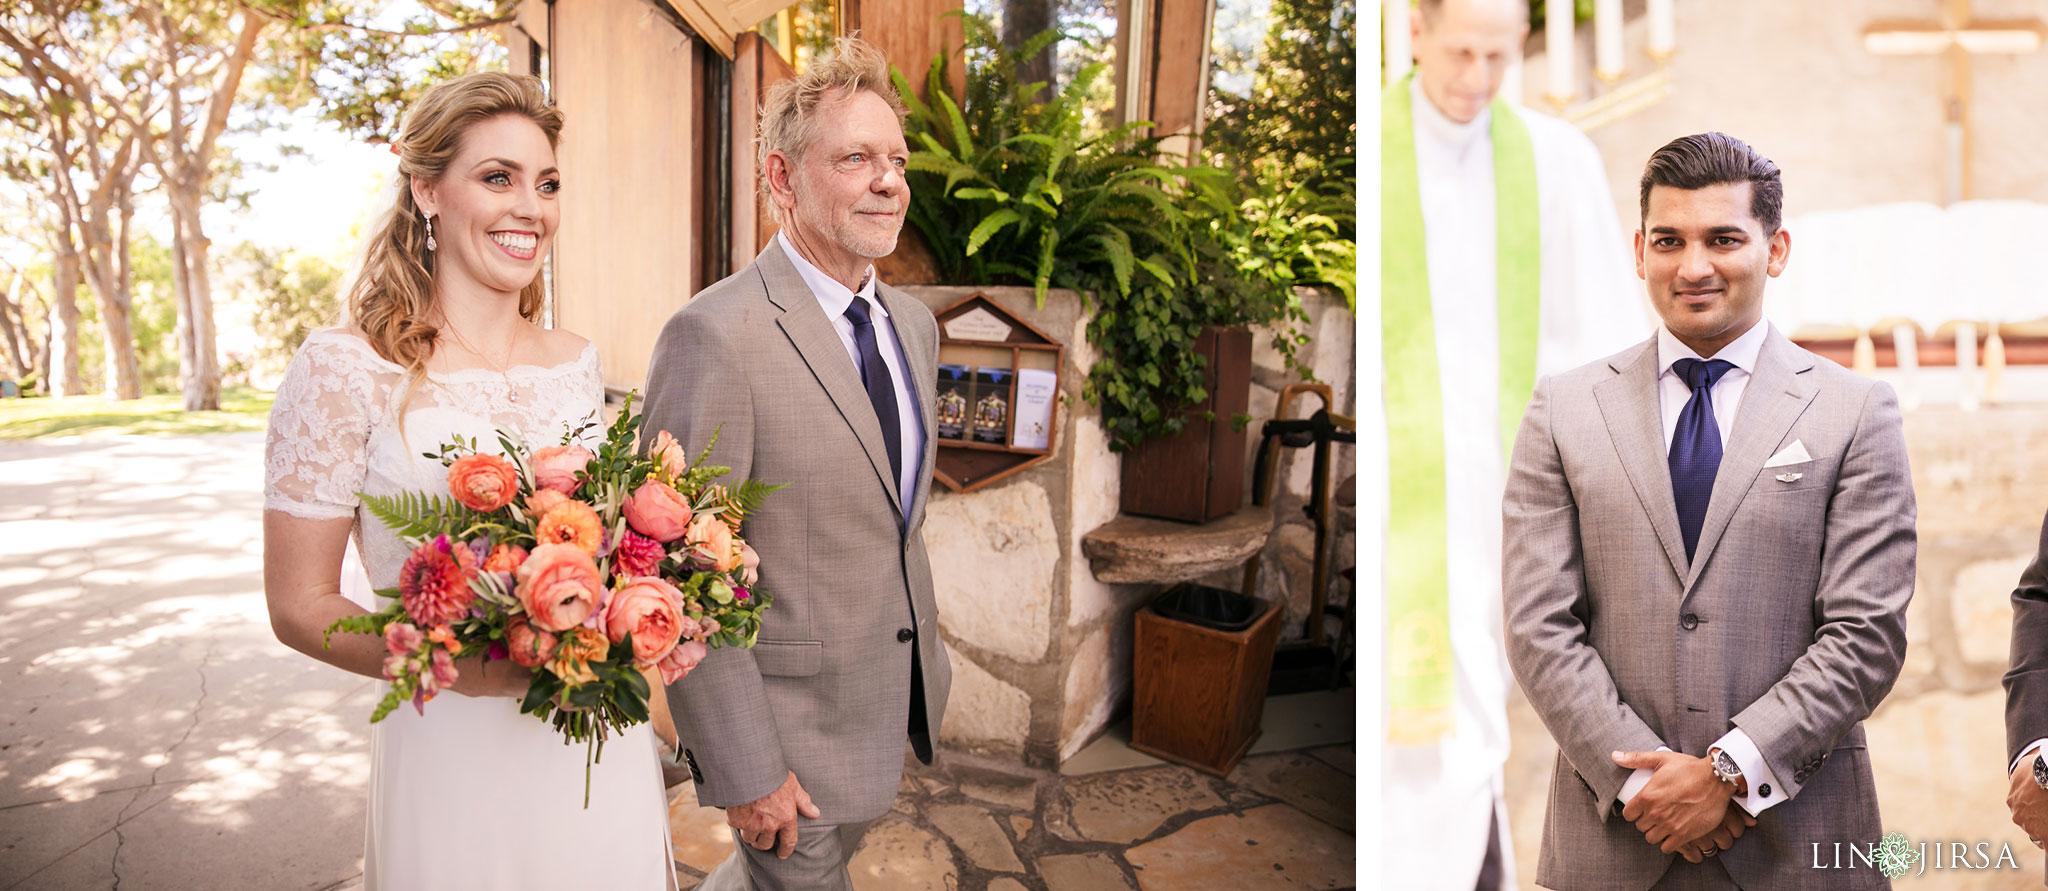 19 wayfarers chapel palos verdes wedding photography